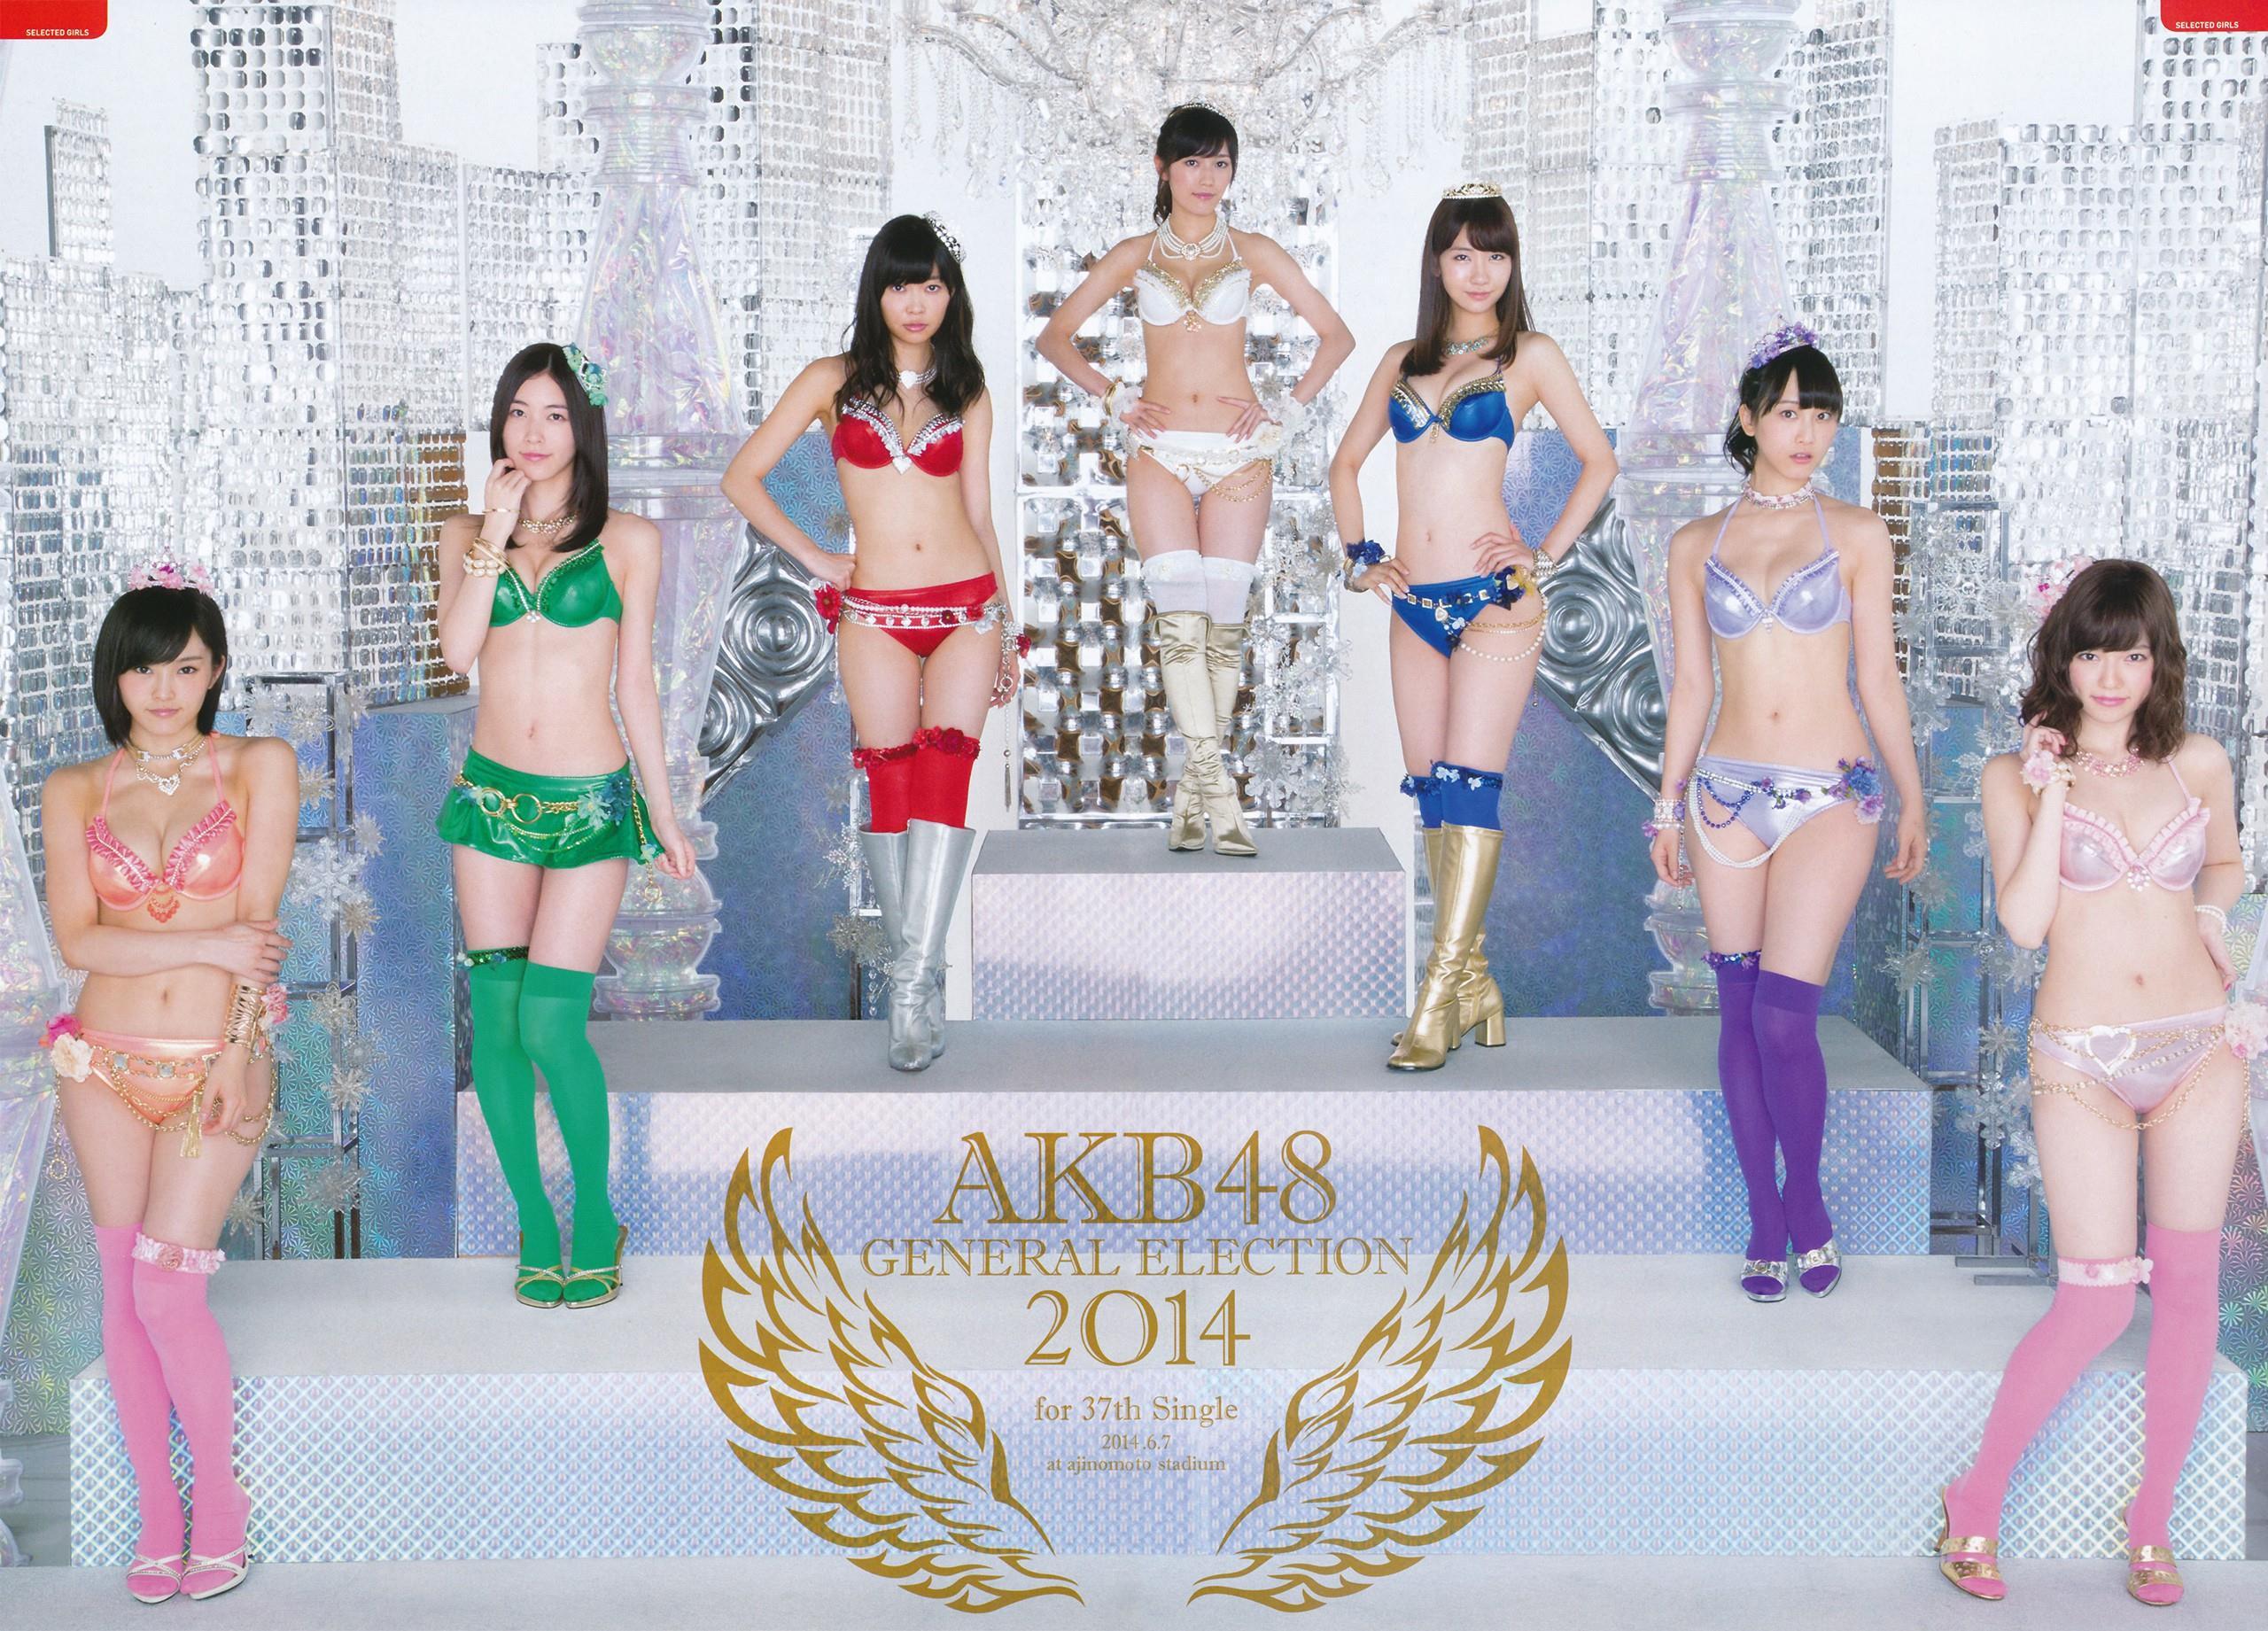 AKB48人気メンバー 画像 3